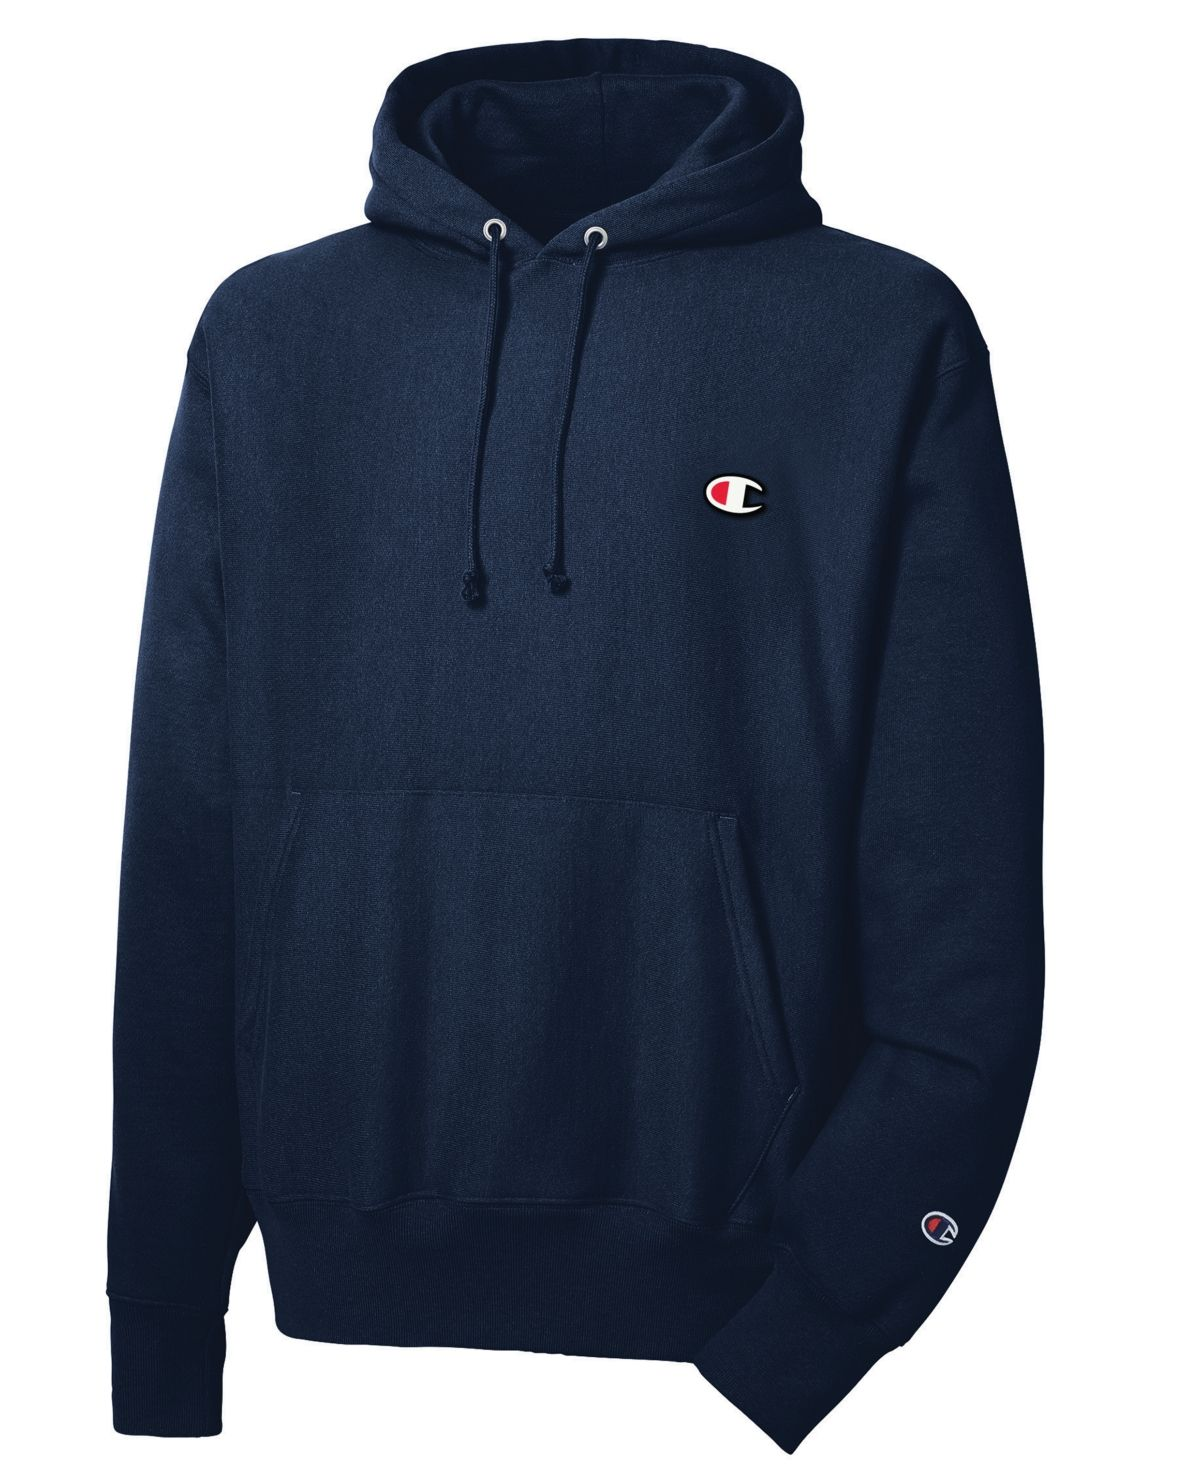 Champion Men S Reverse Weave Hoodie Navy Mens Sweatshirts Hoodies Sweatshirts [ 1467 x 1200 Pixel ]